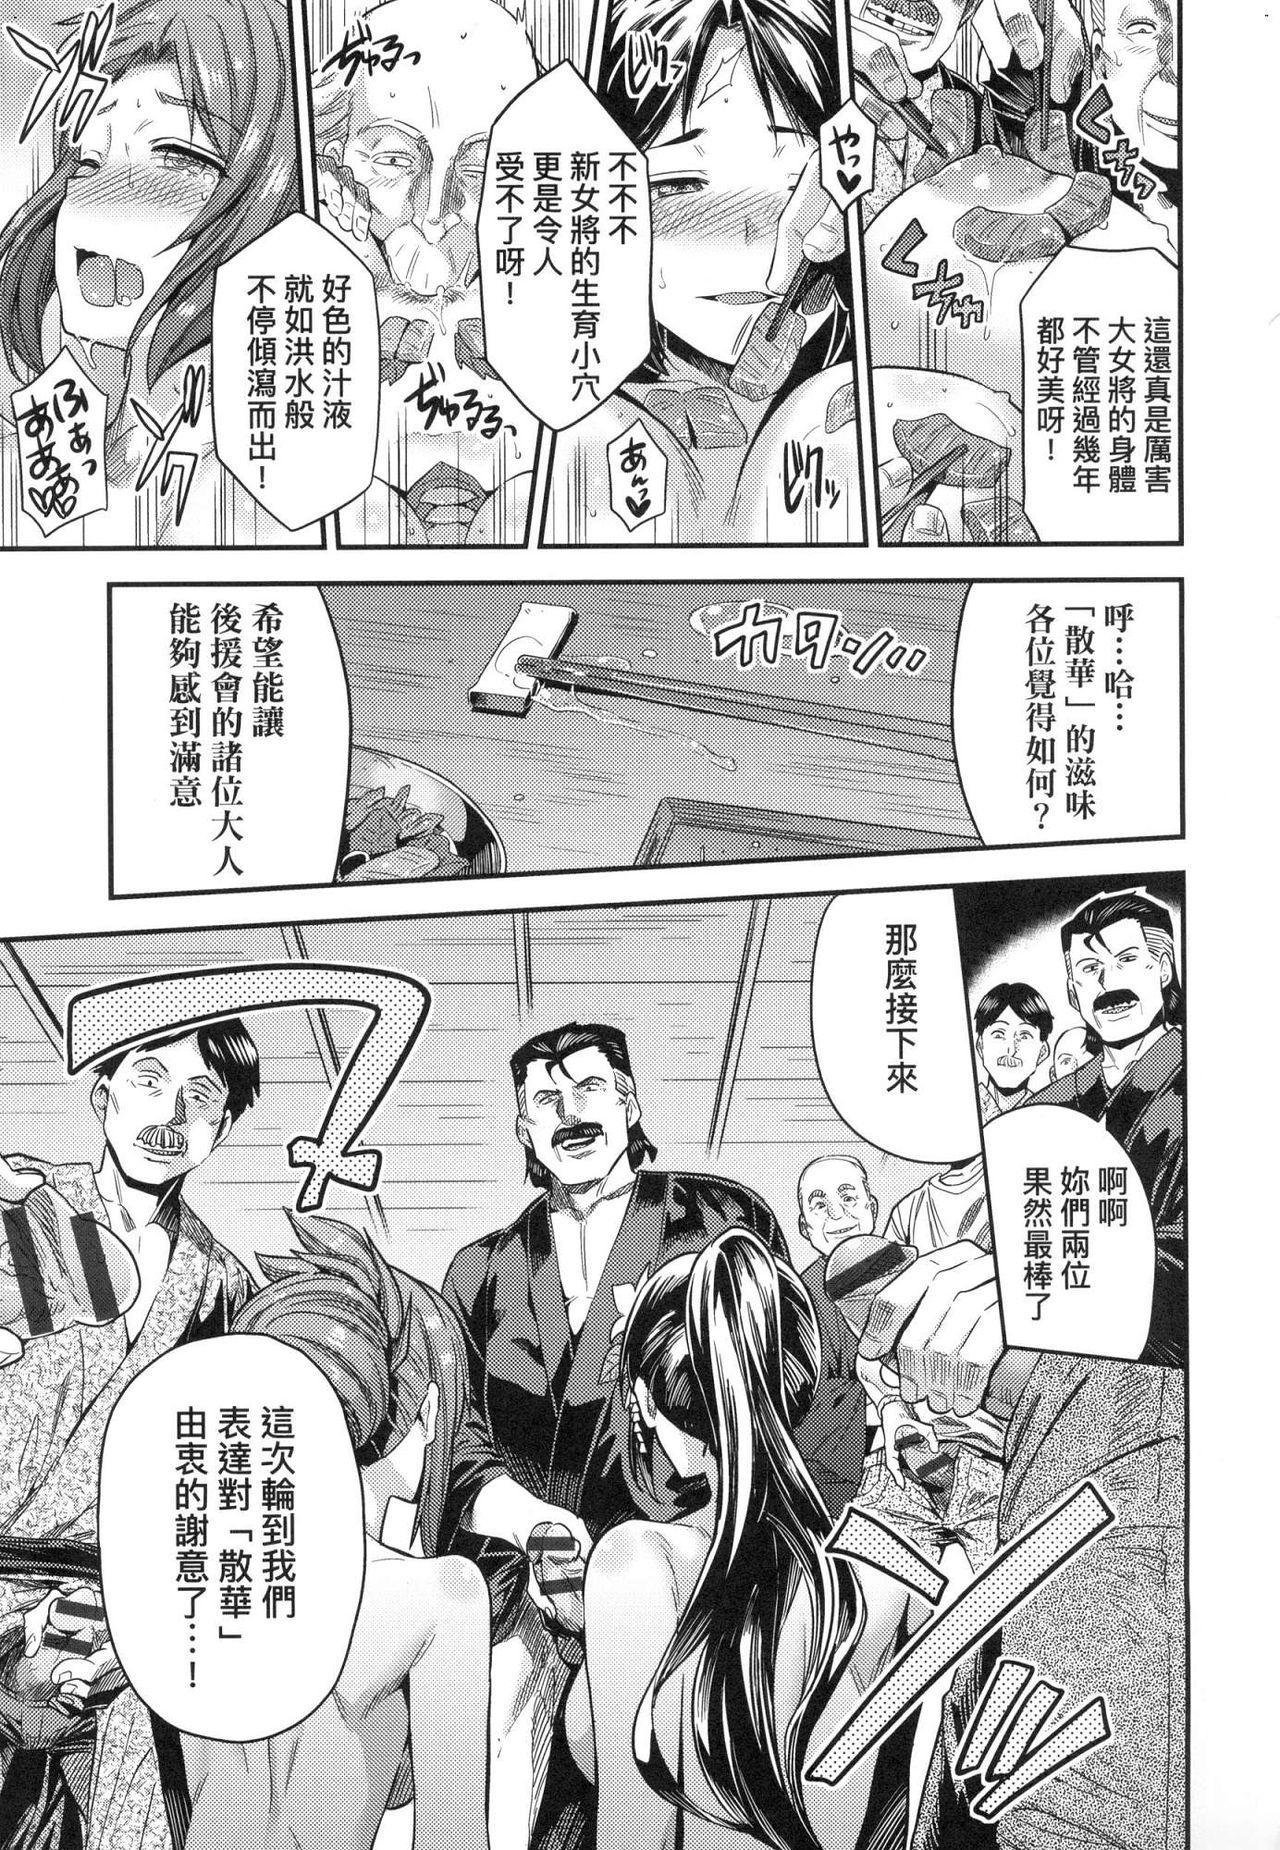 Kyousei Tanetsuke Express - Forced Seeding Express 202